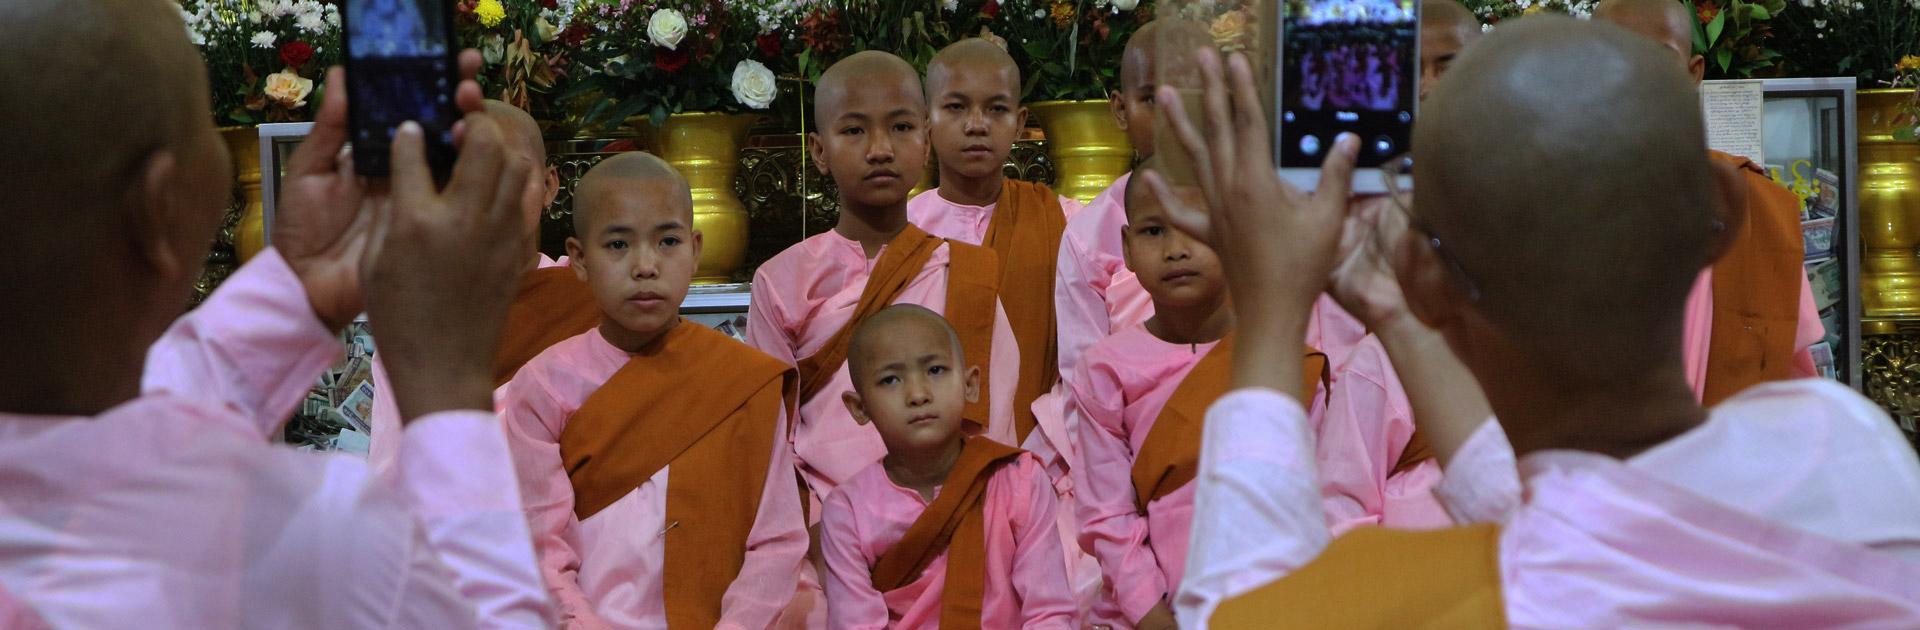 MM Myanmar Patrimonio Natural 11 días 2